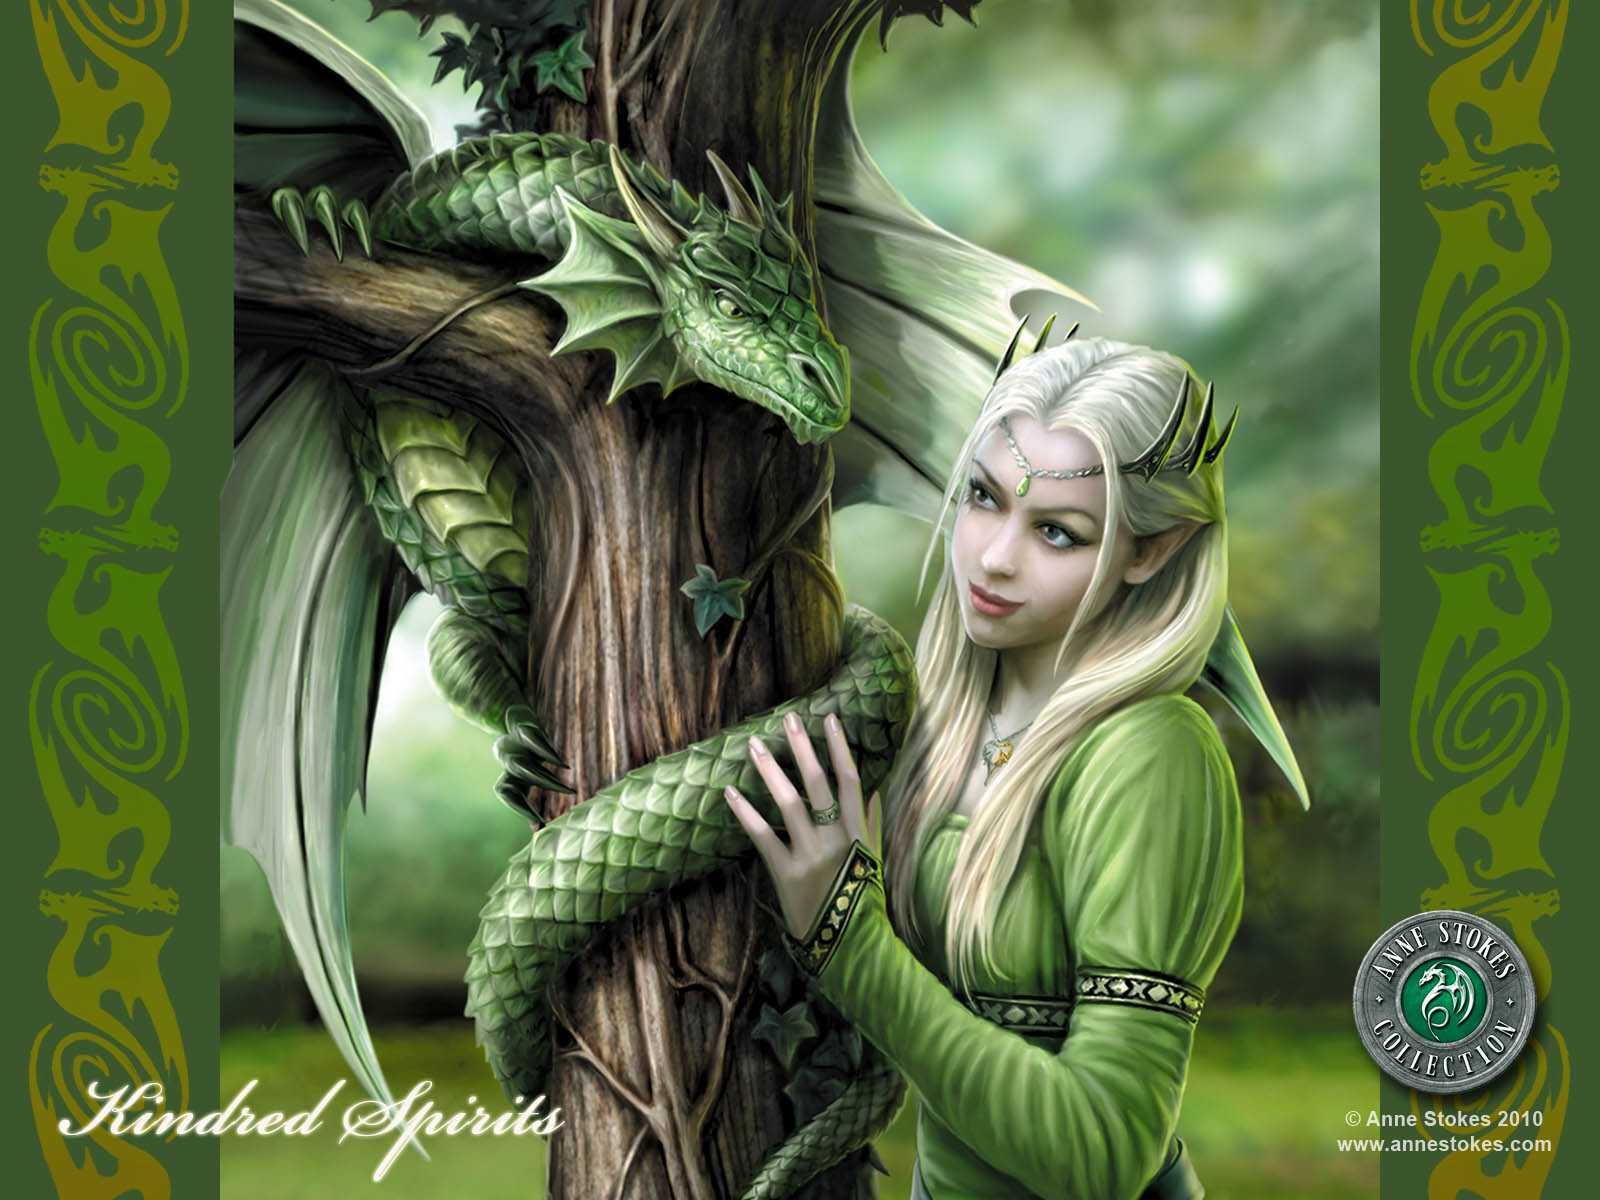 kindred_spirits_1600x1200